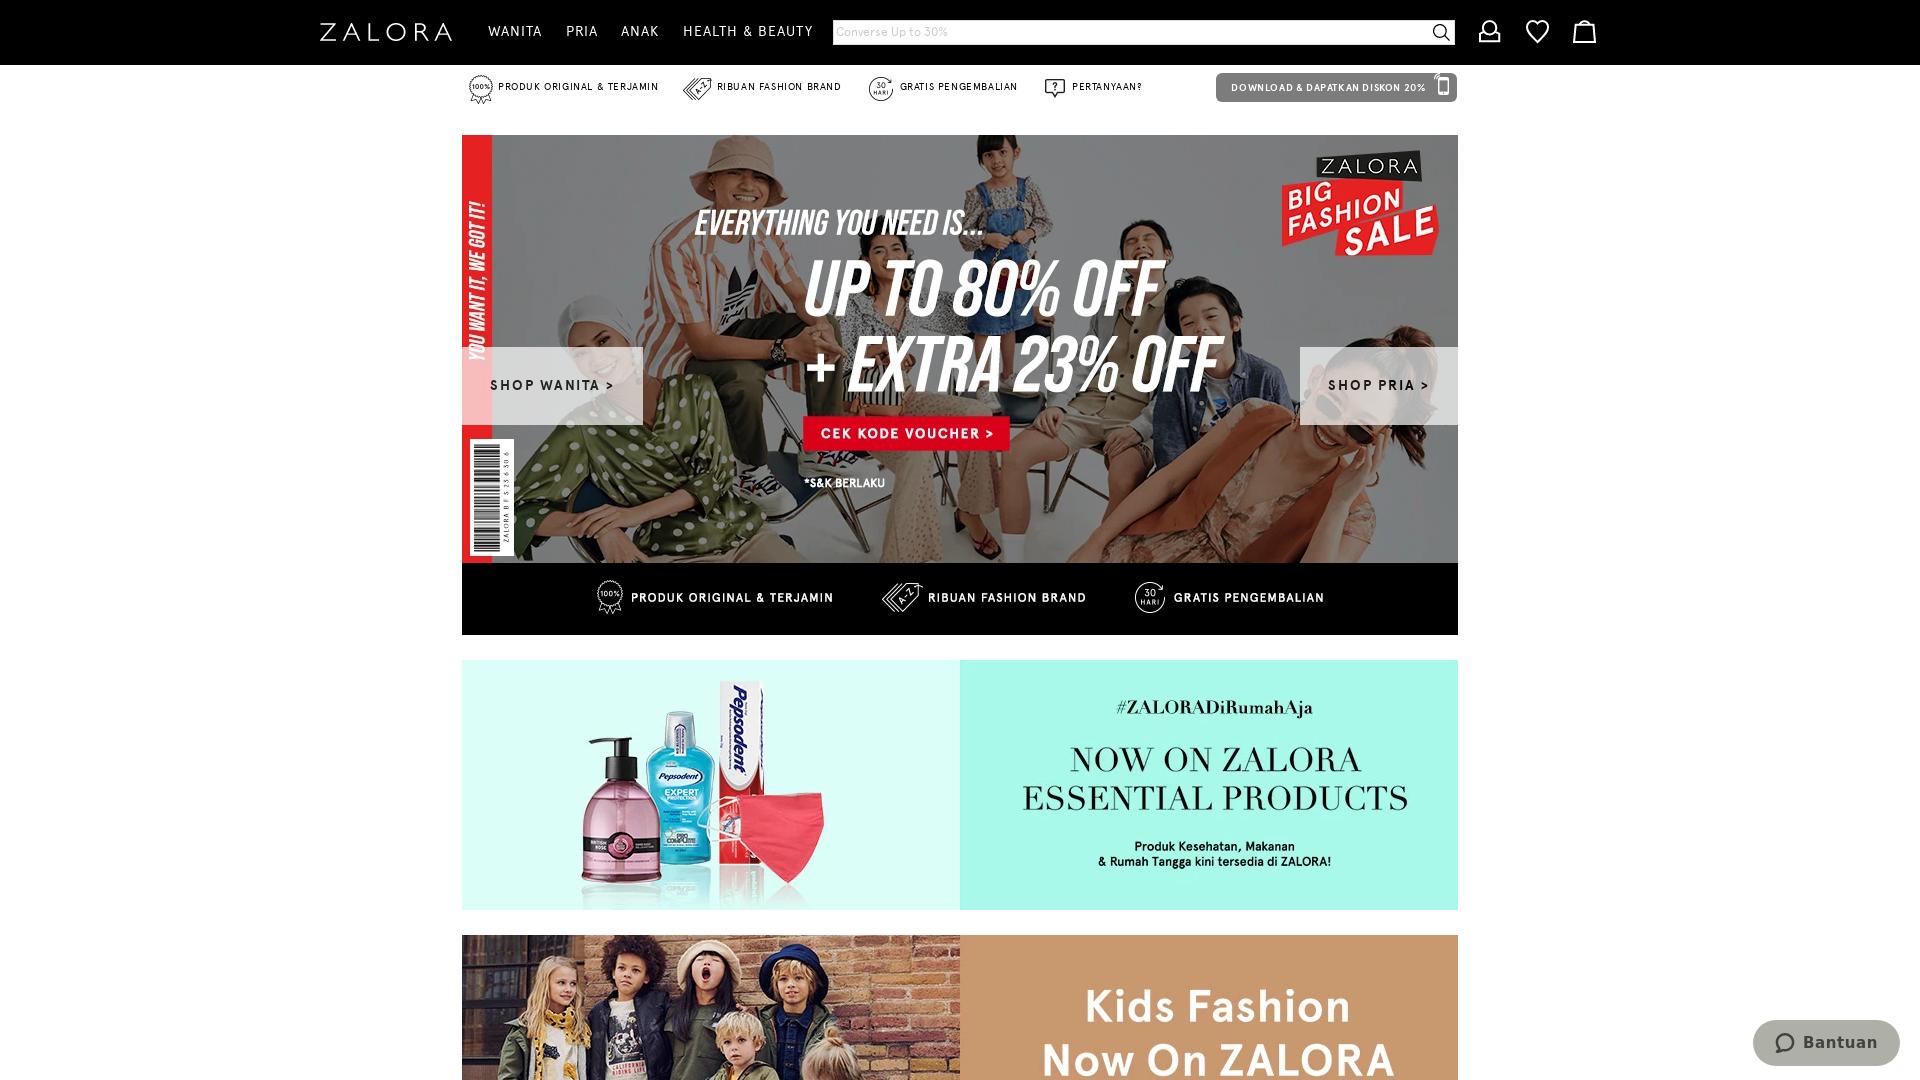 Zalora Indonesia website